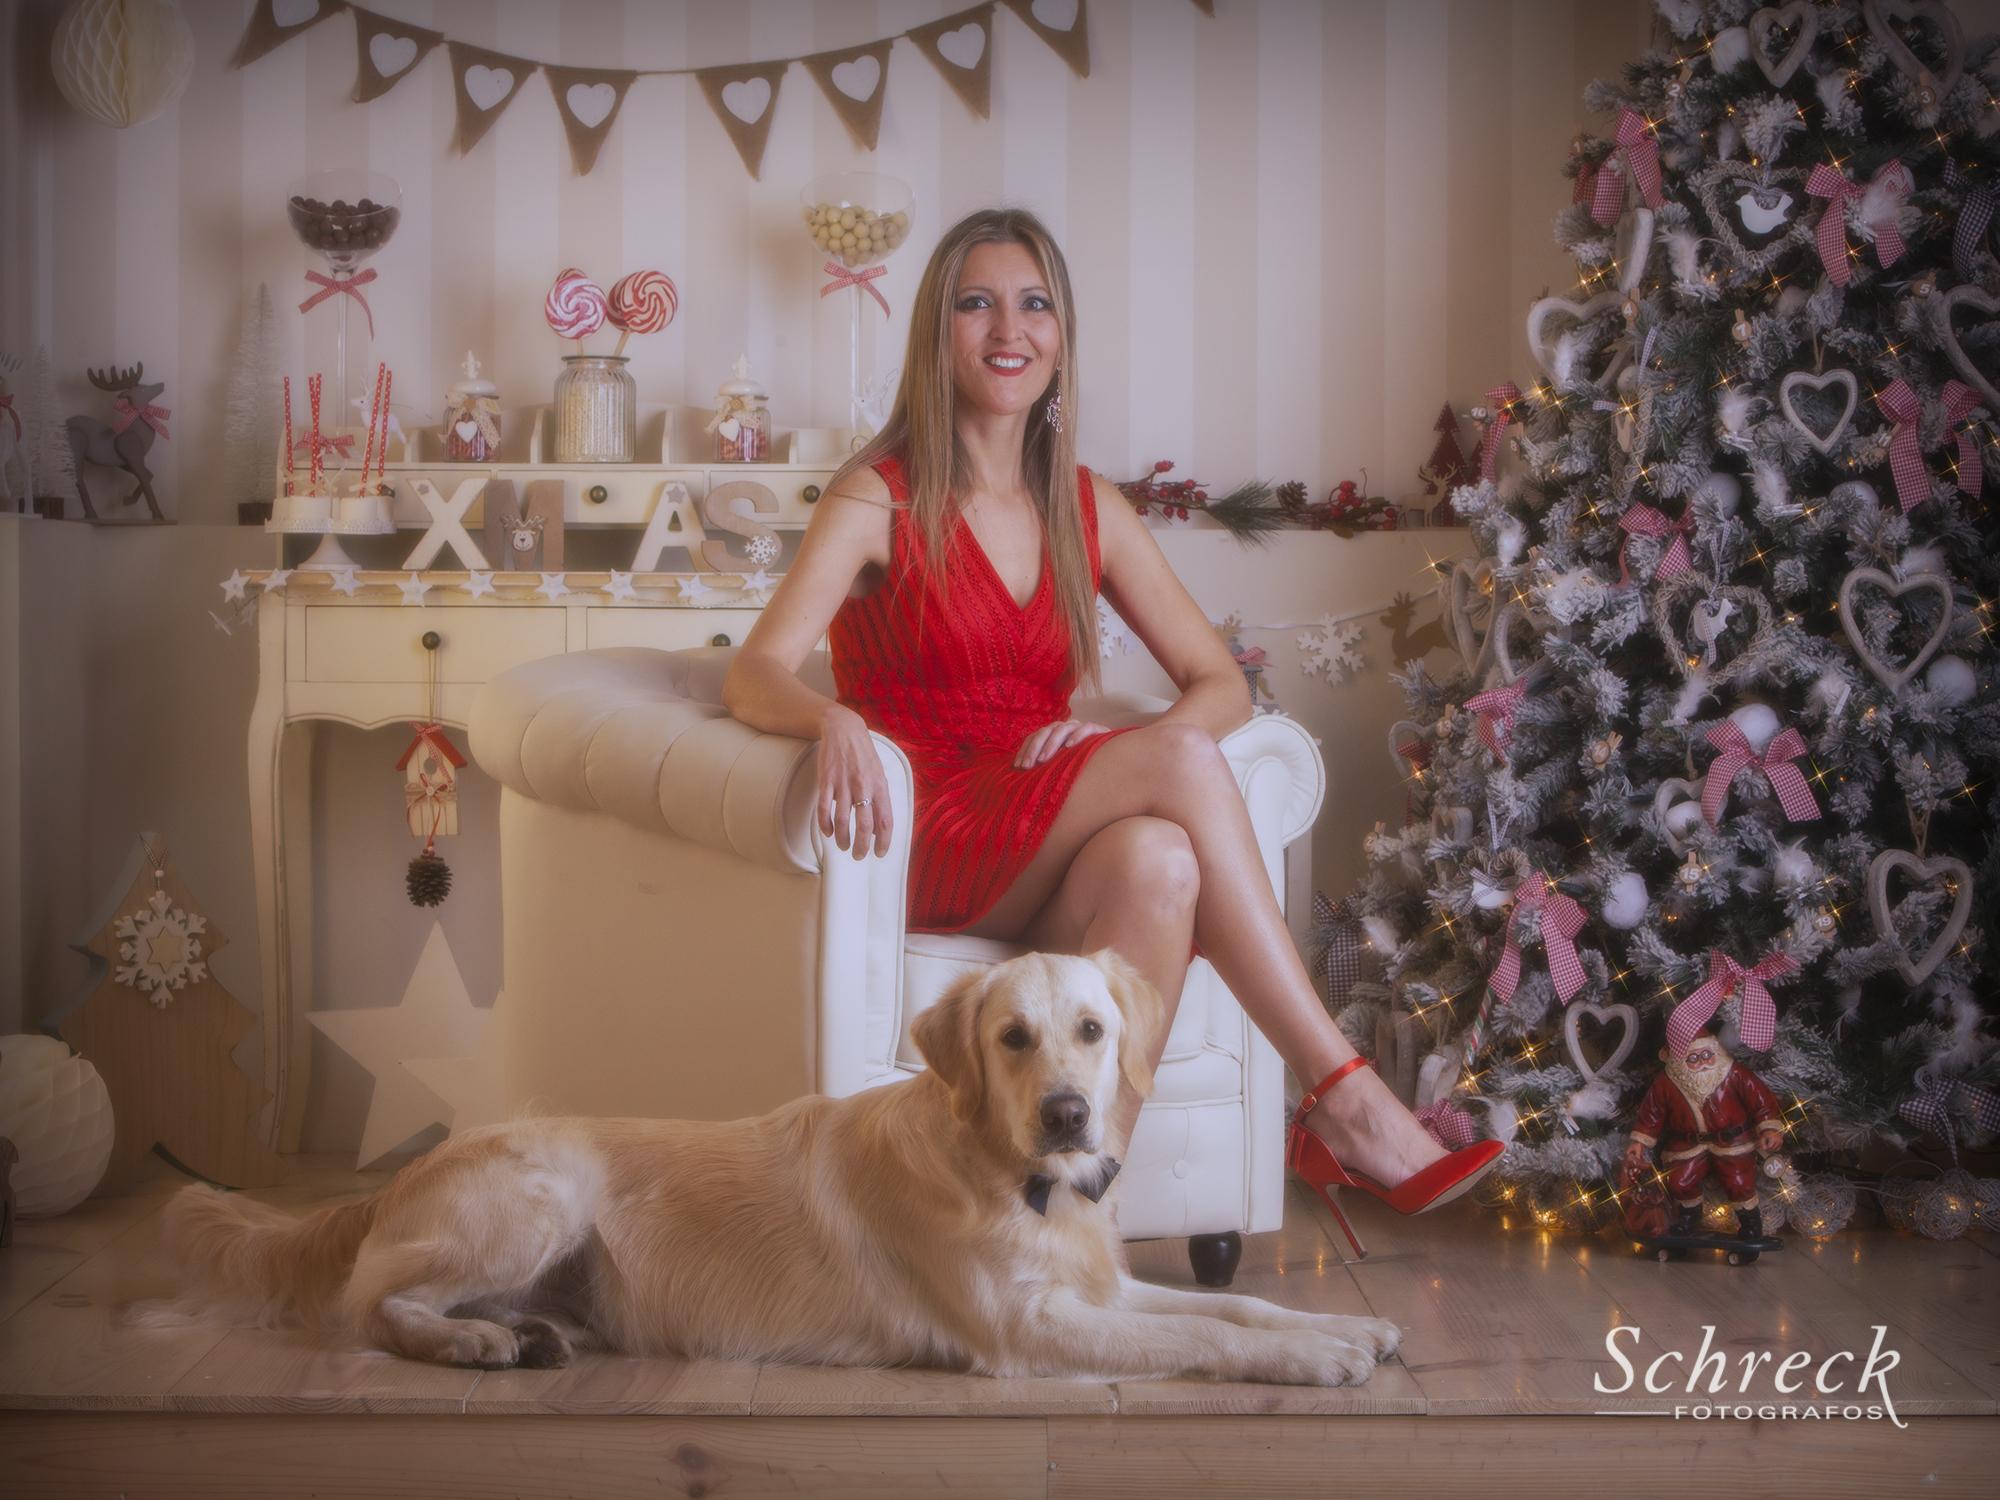 Schreck-Christmas_23